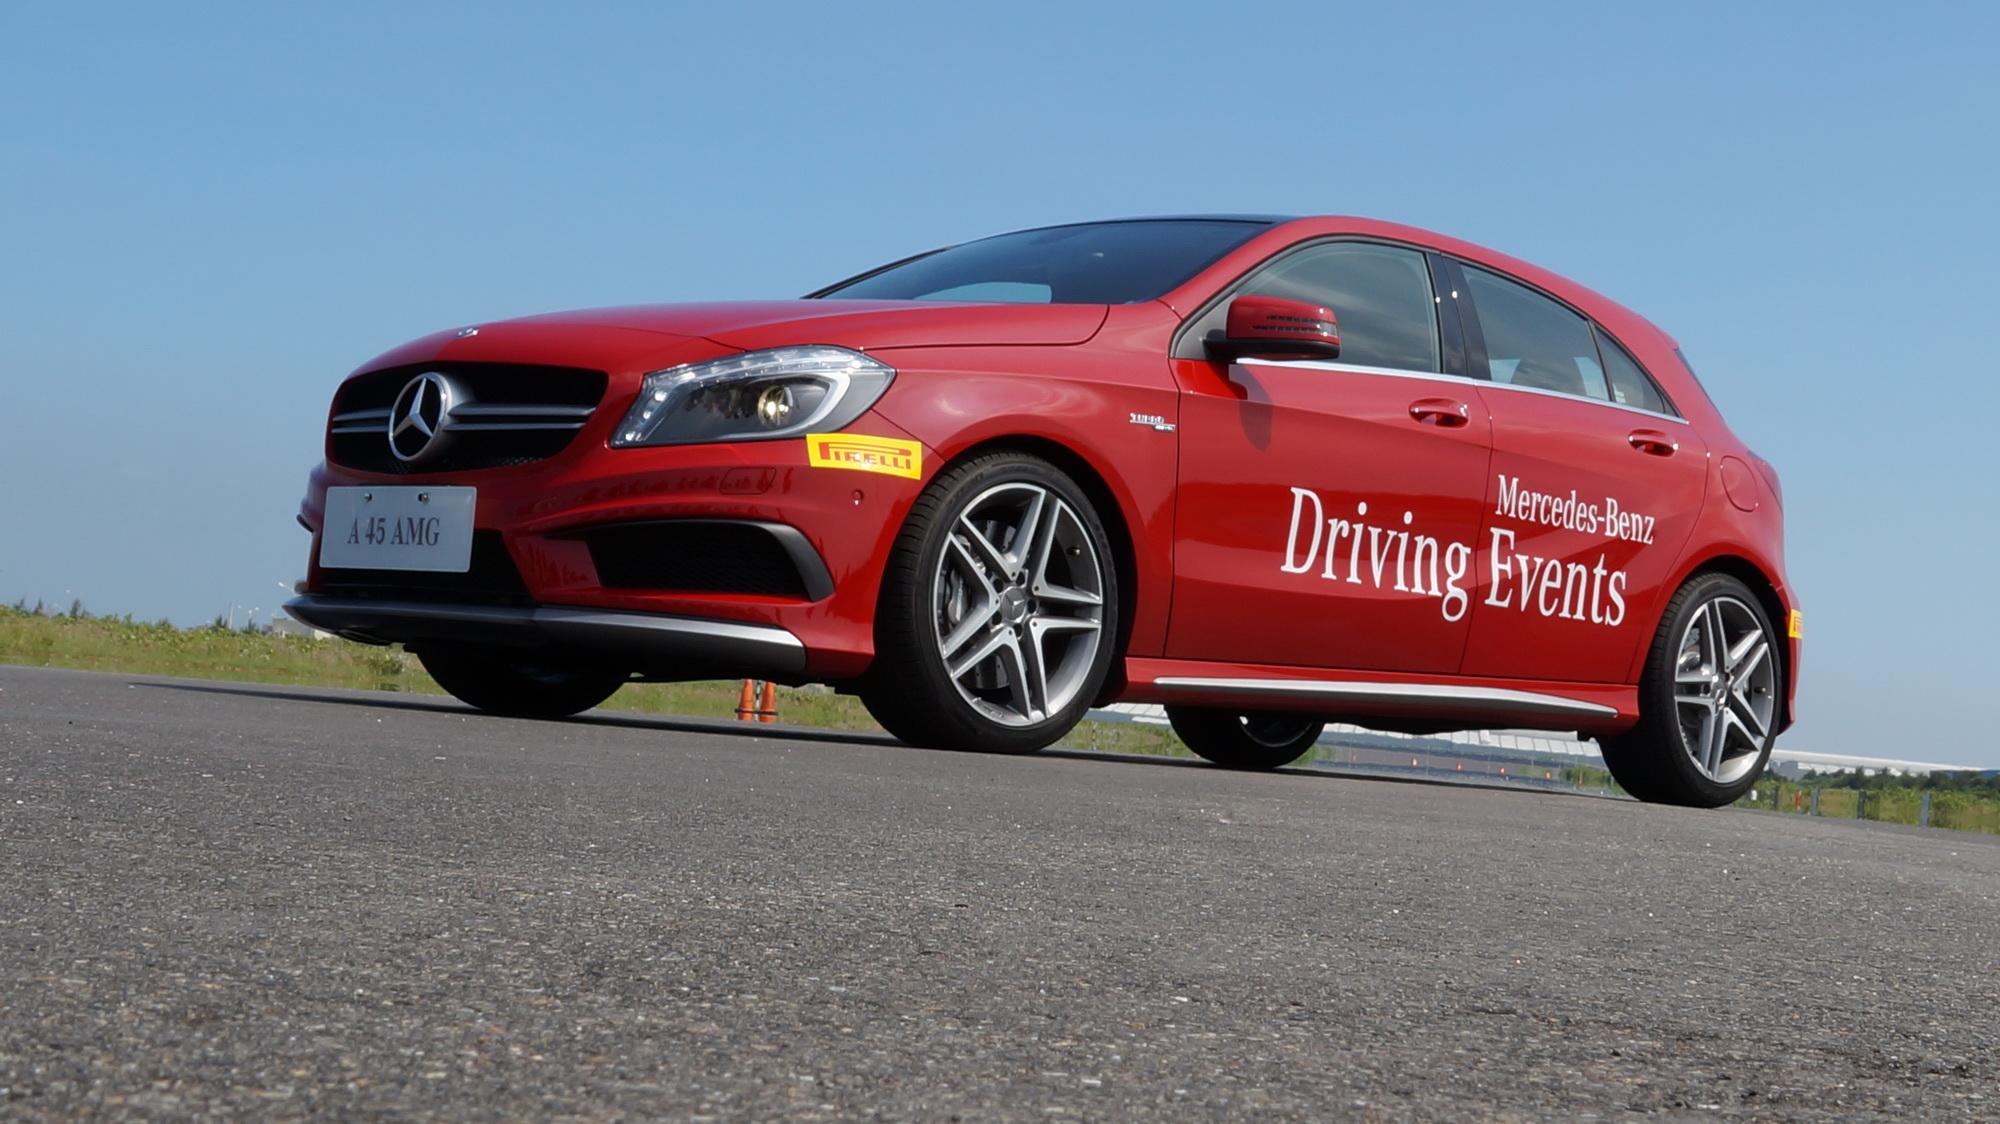 2013 Mercedes-Benz進階駕馭體驗營:A 45 AMG的濃濃燒胎味如同興奮劑叫人High翻天!